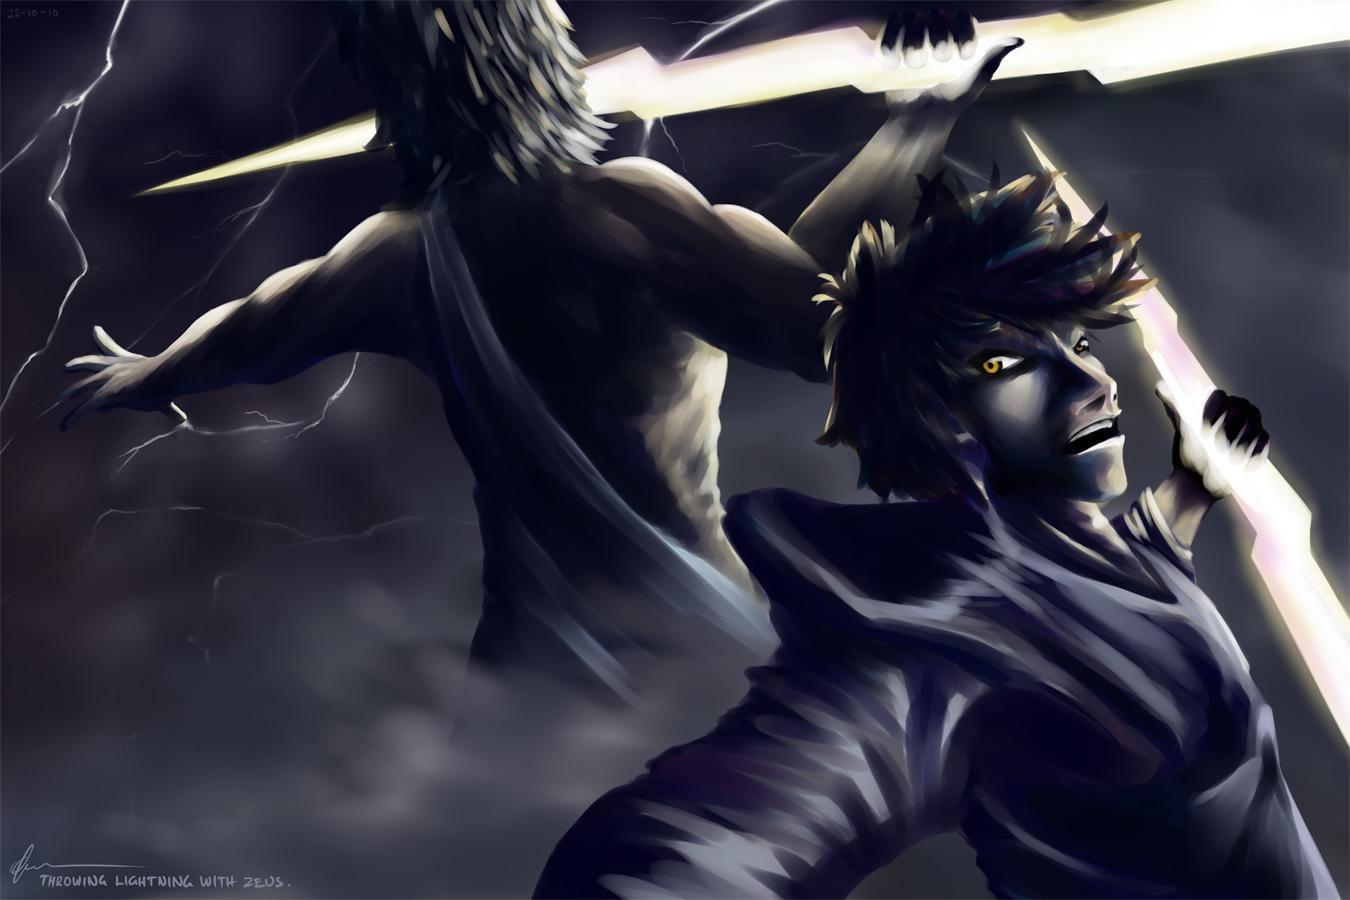 Throwing Lightning With Zeus.